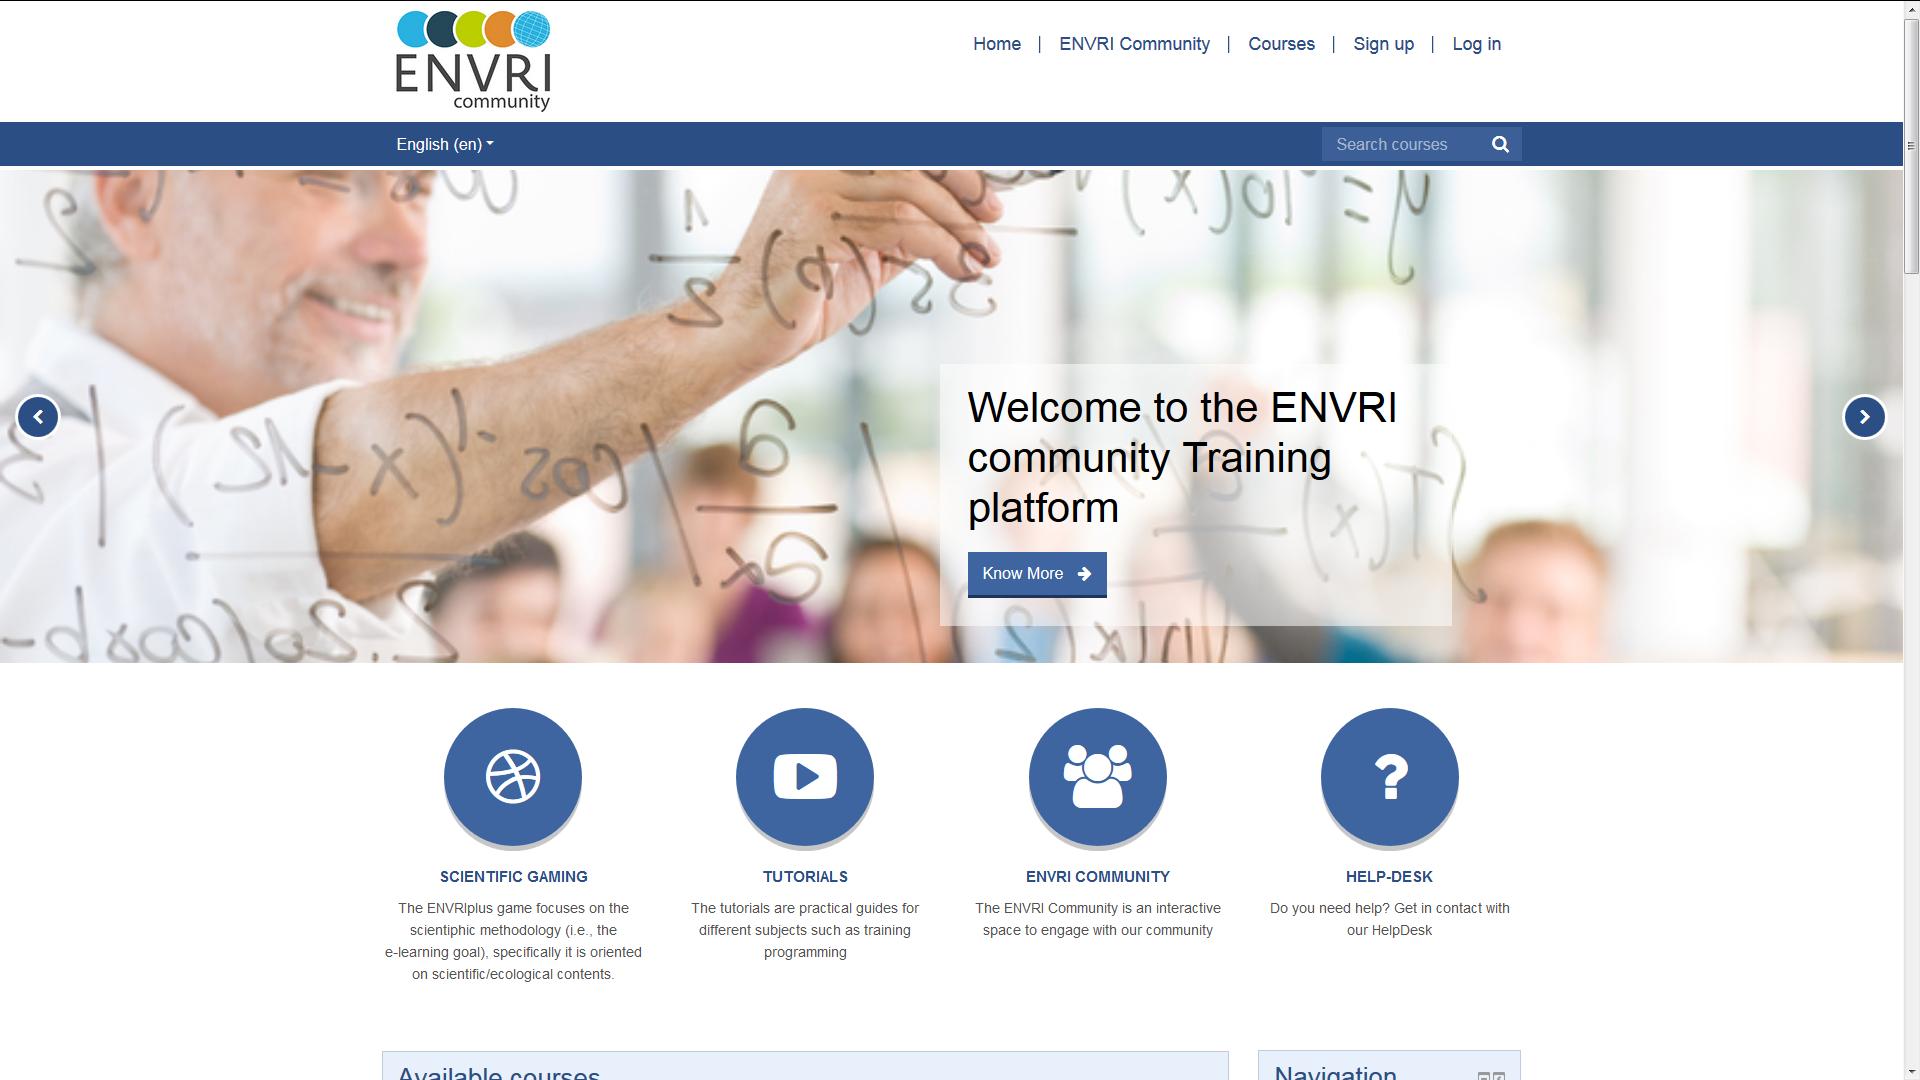 20200724 screen capture of the ENVRI Community Training Platform front page